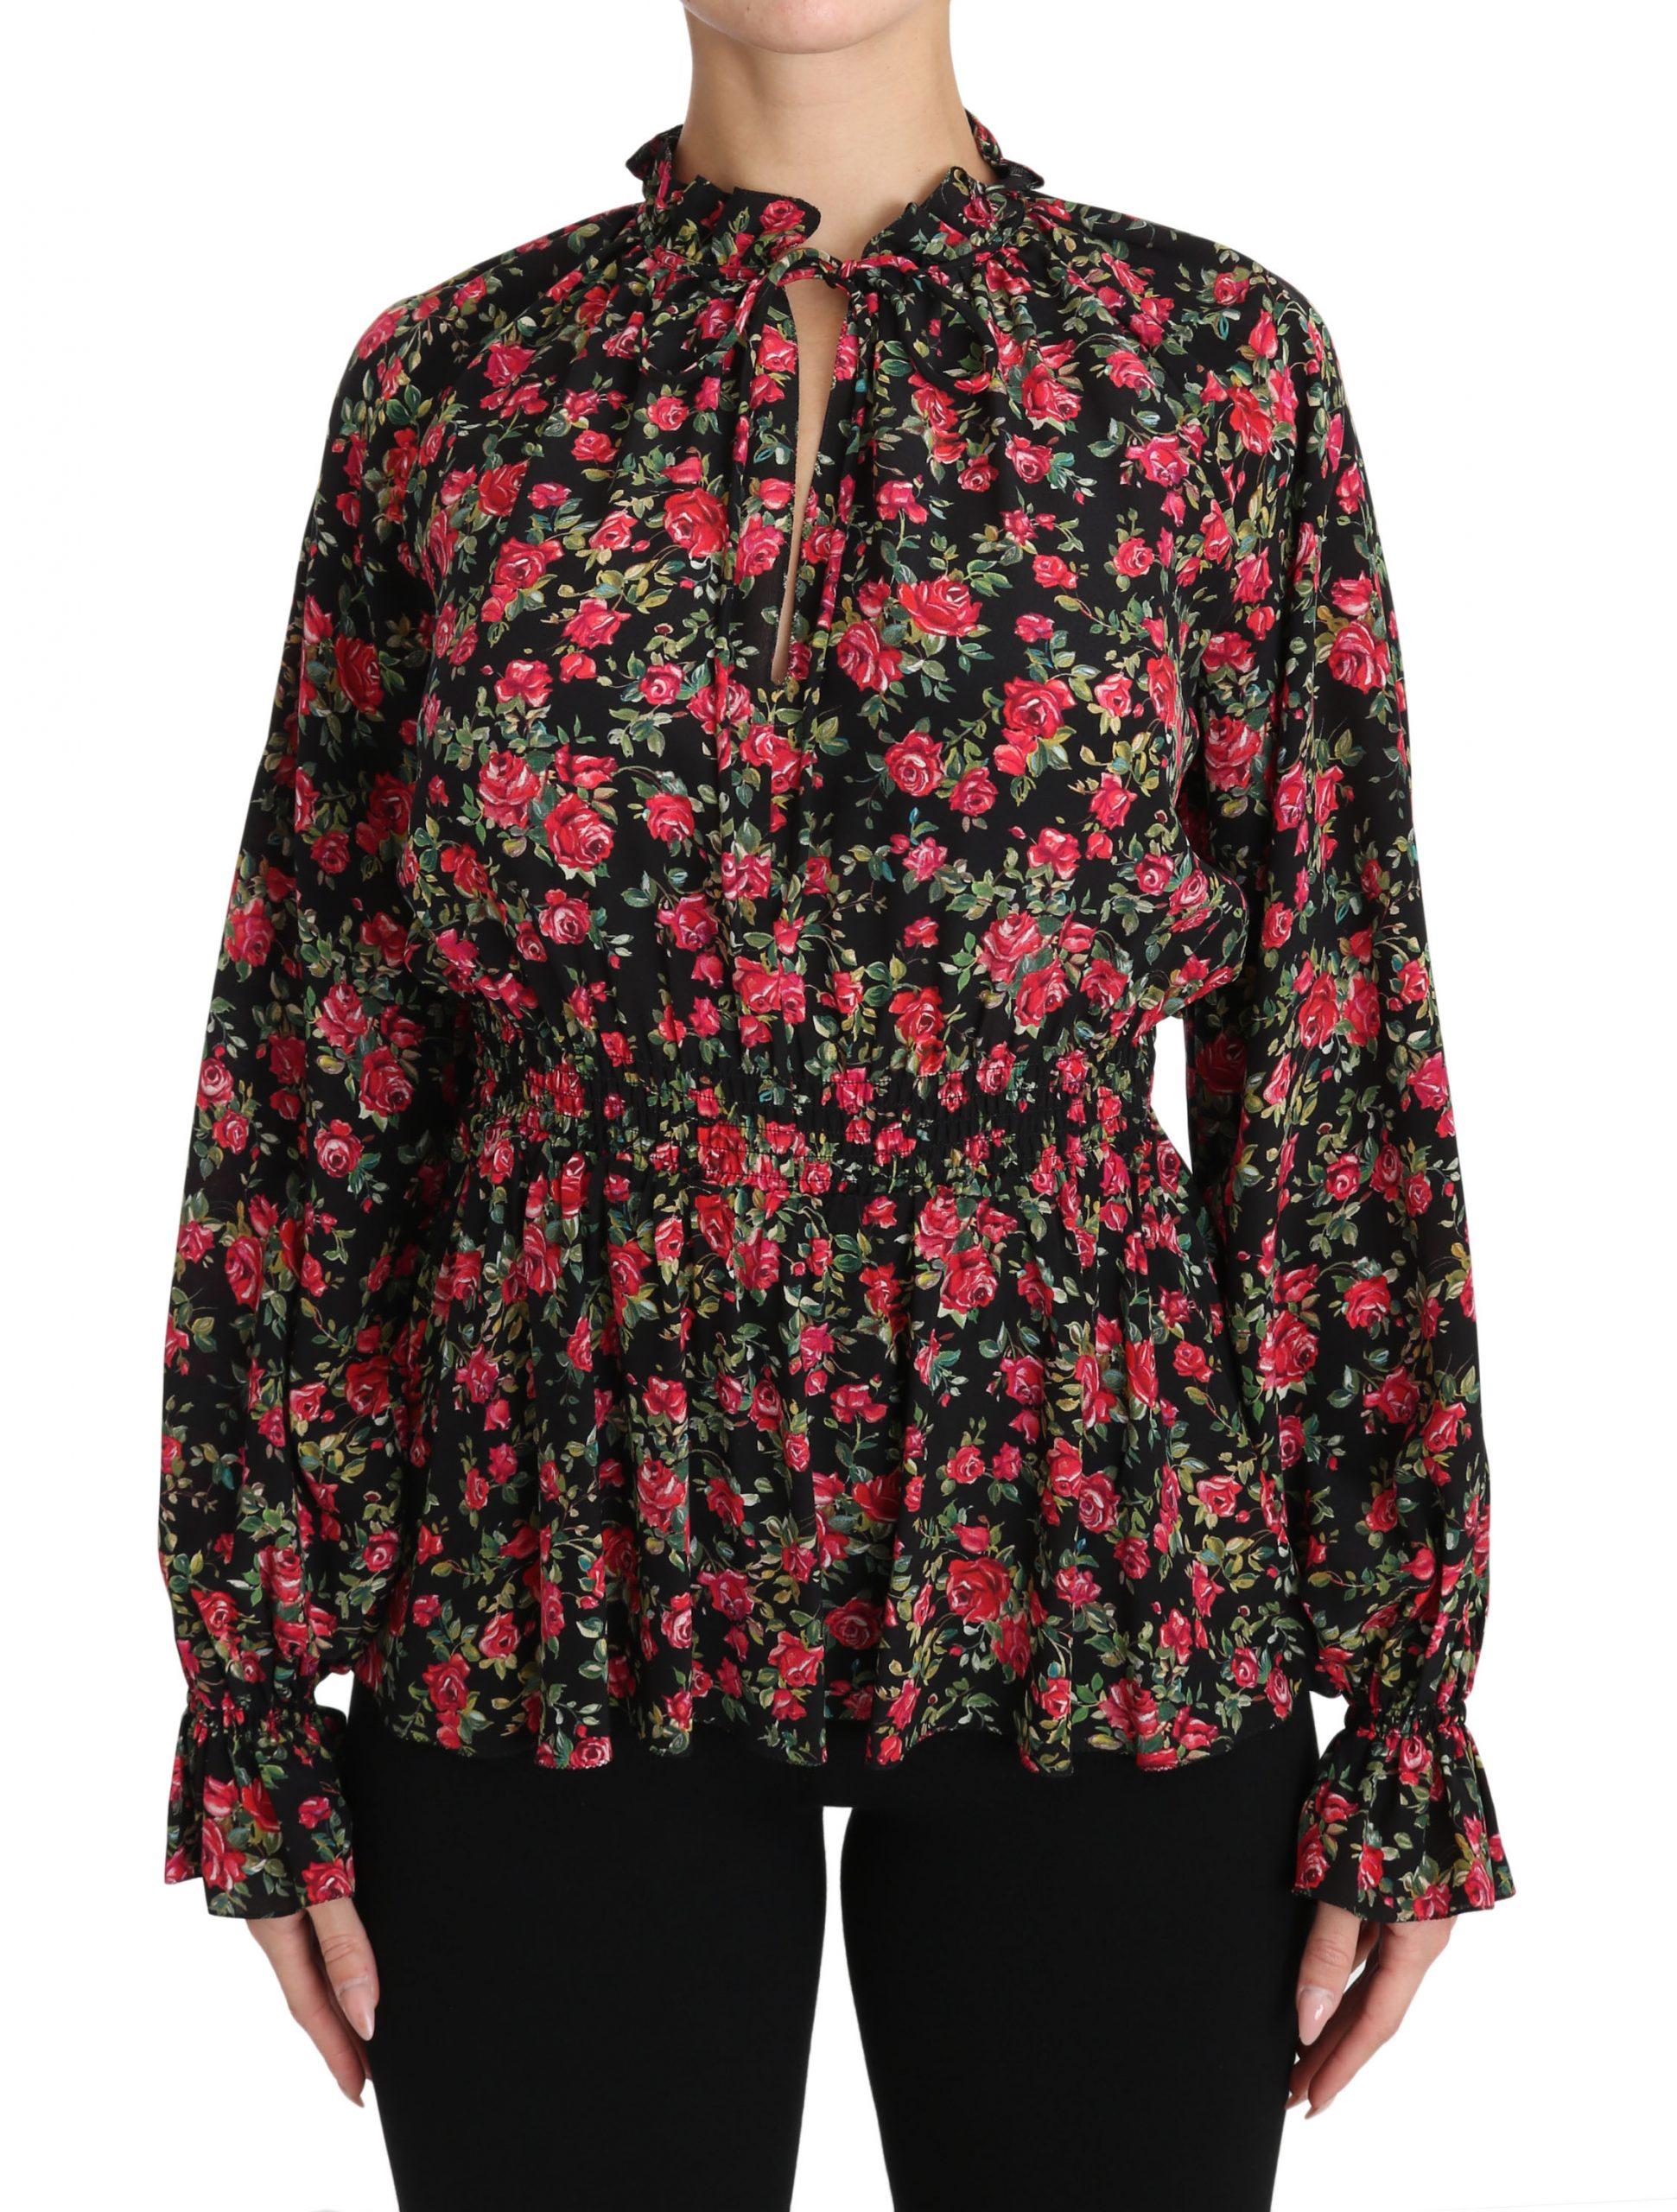 Dolce & Gabbana Women's Floral Elasticated Shirts Black TSH3131 - IT36|XXS